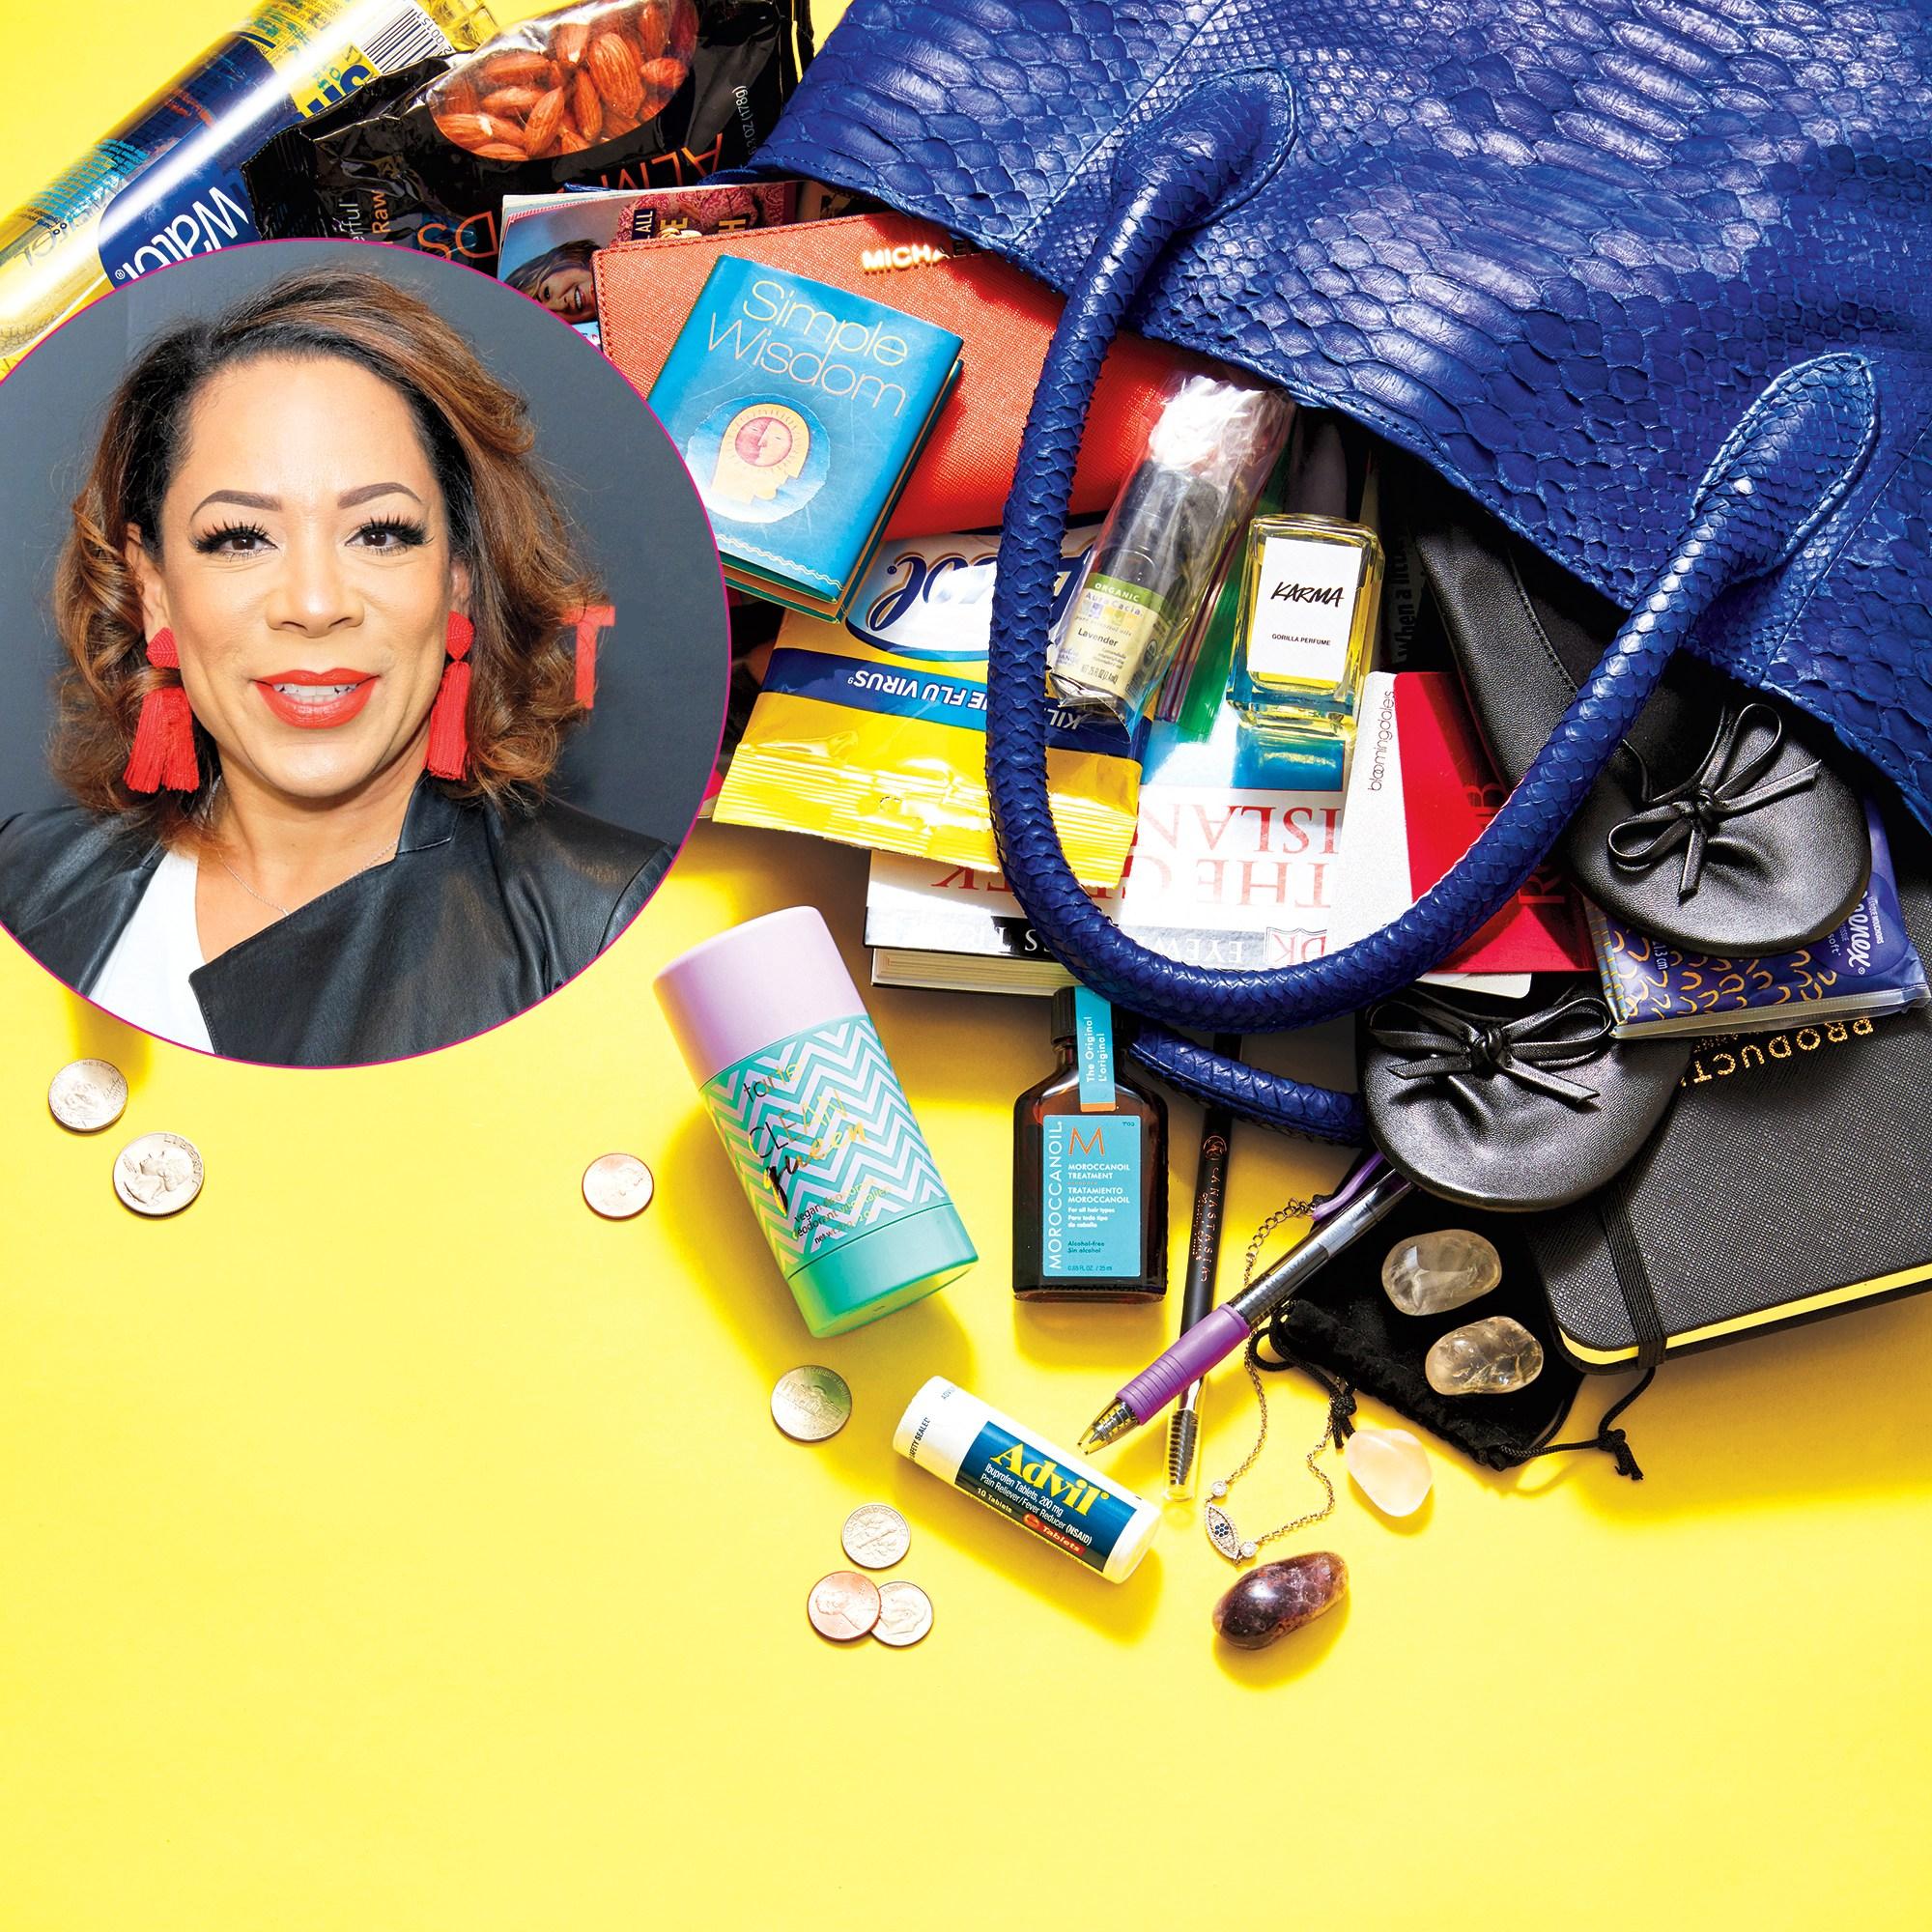 Selenis Leyva: What's In My Bag?